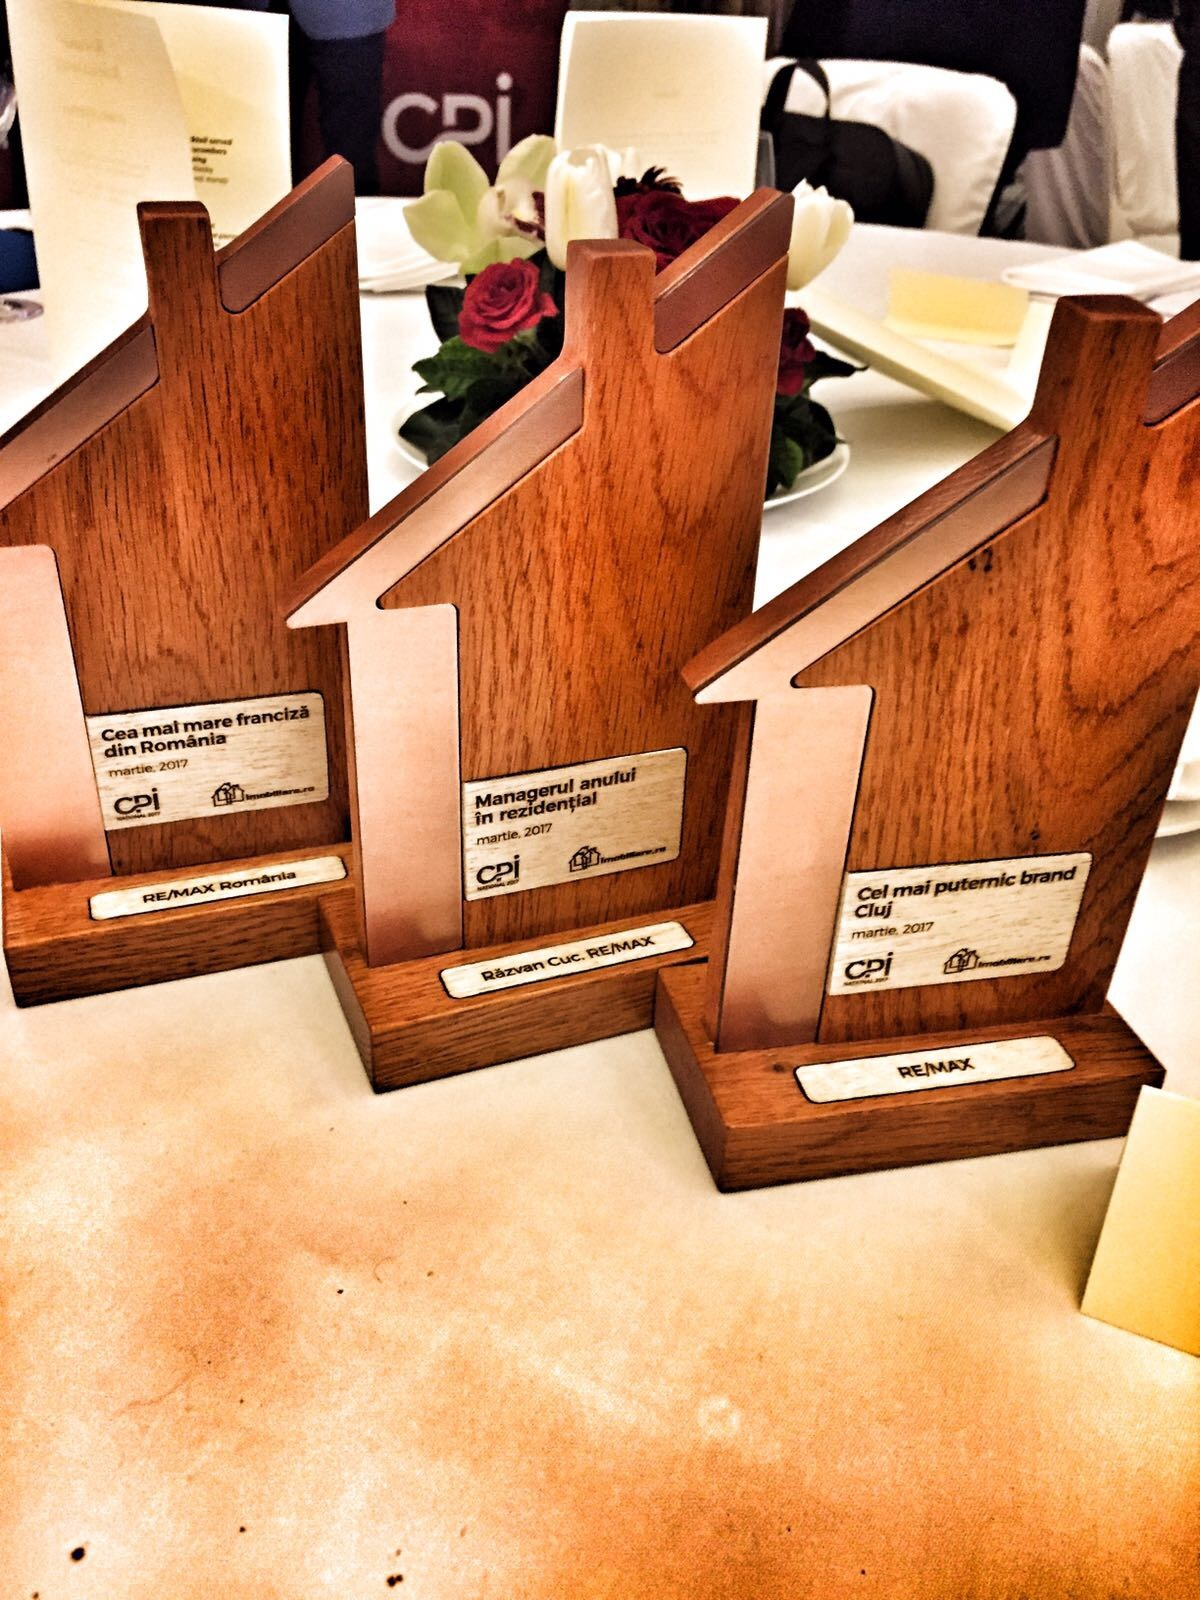 3 premii importante pentru RE/MAX România la Gala CPI Național 2017